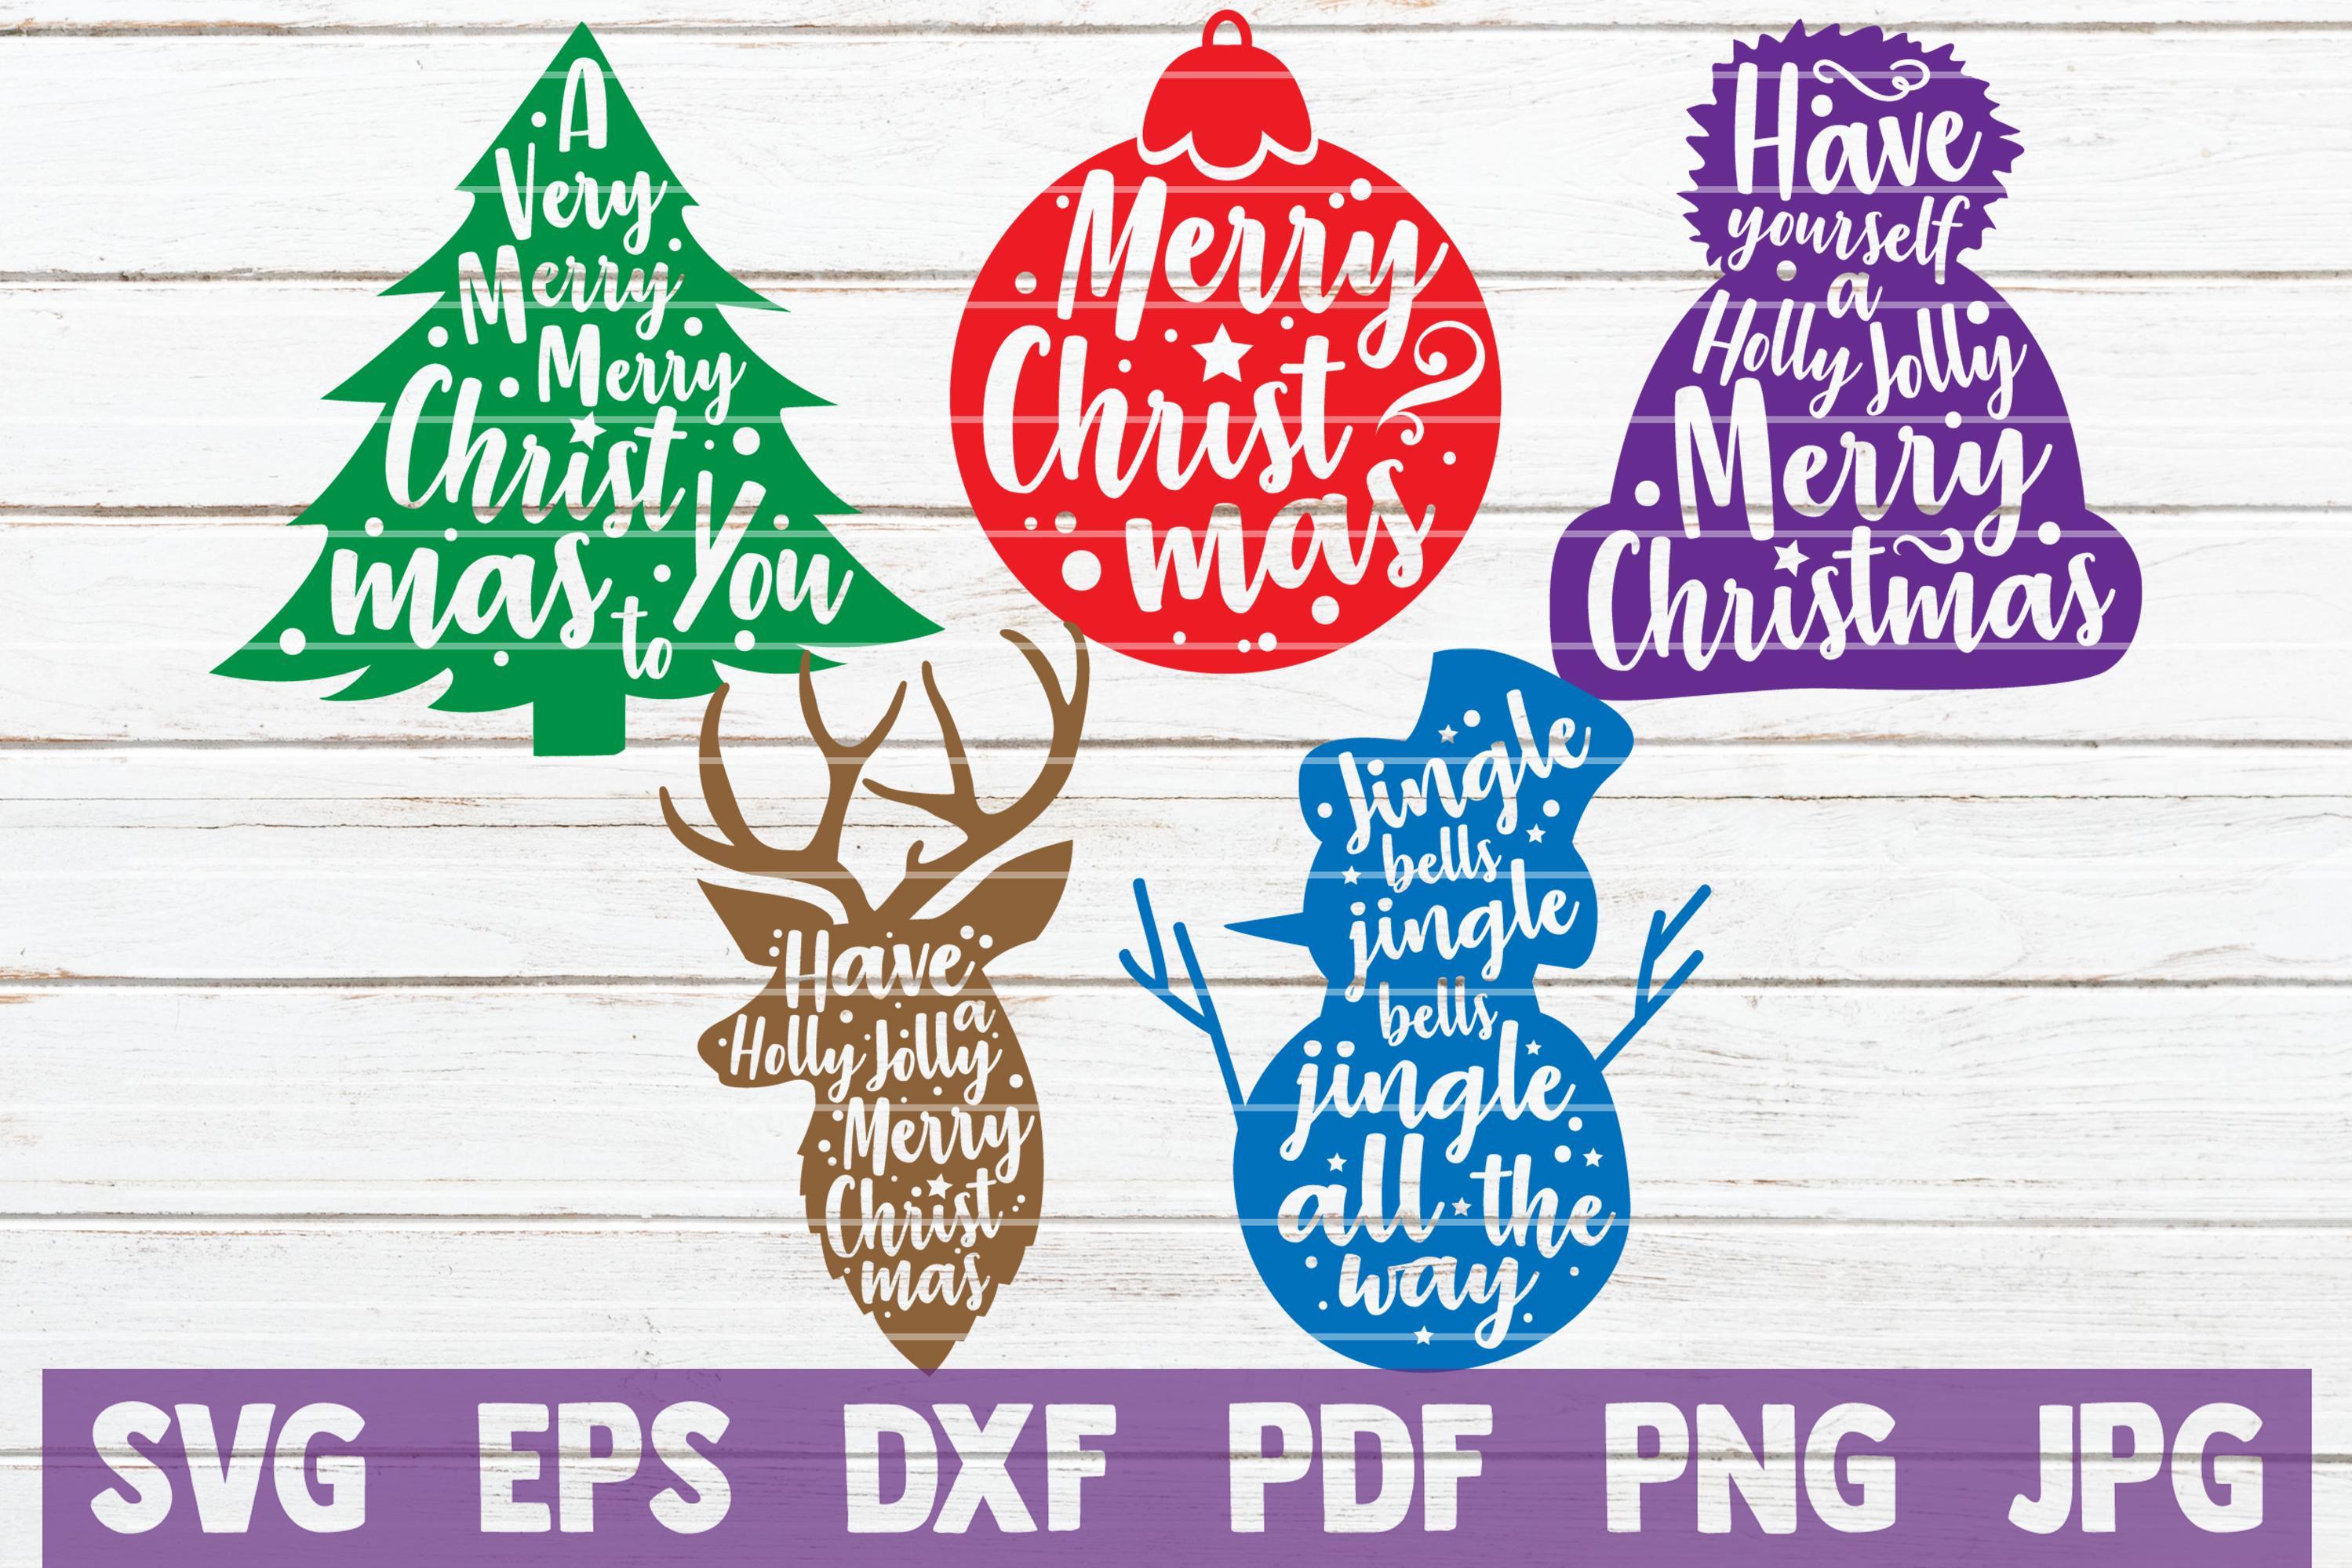 HUGE Christmas SVG Bundle |100 Holiday Designs SVG Cut Files example image 7